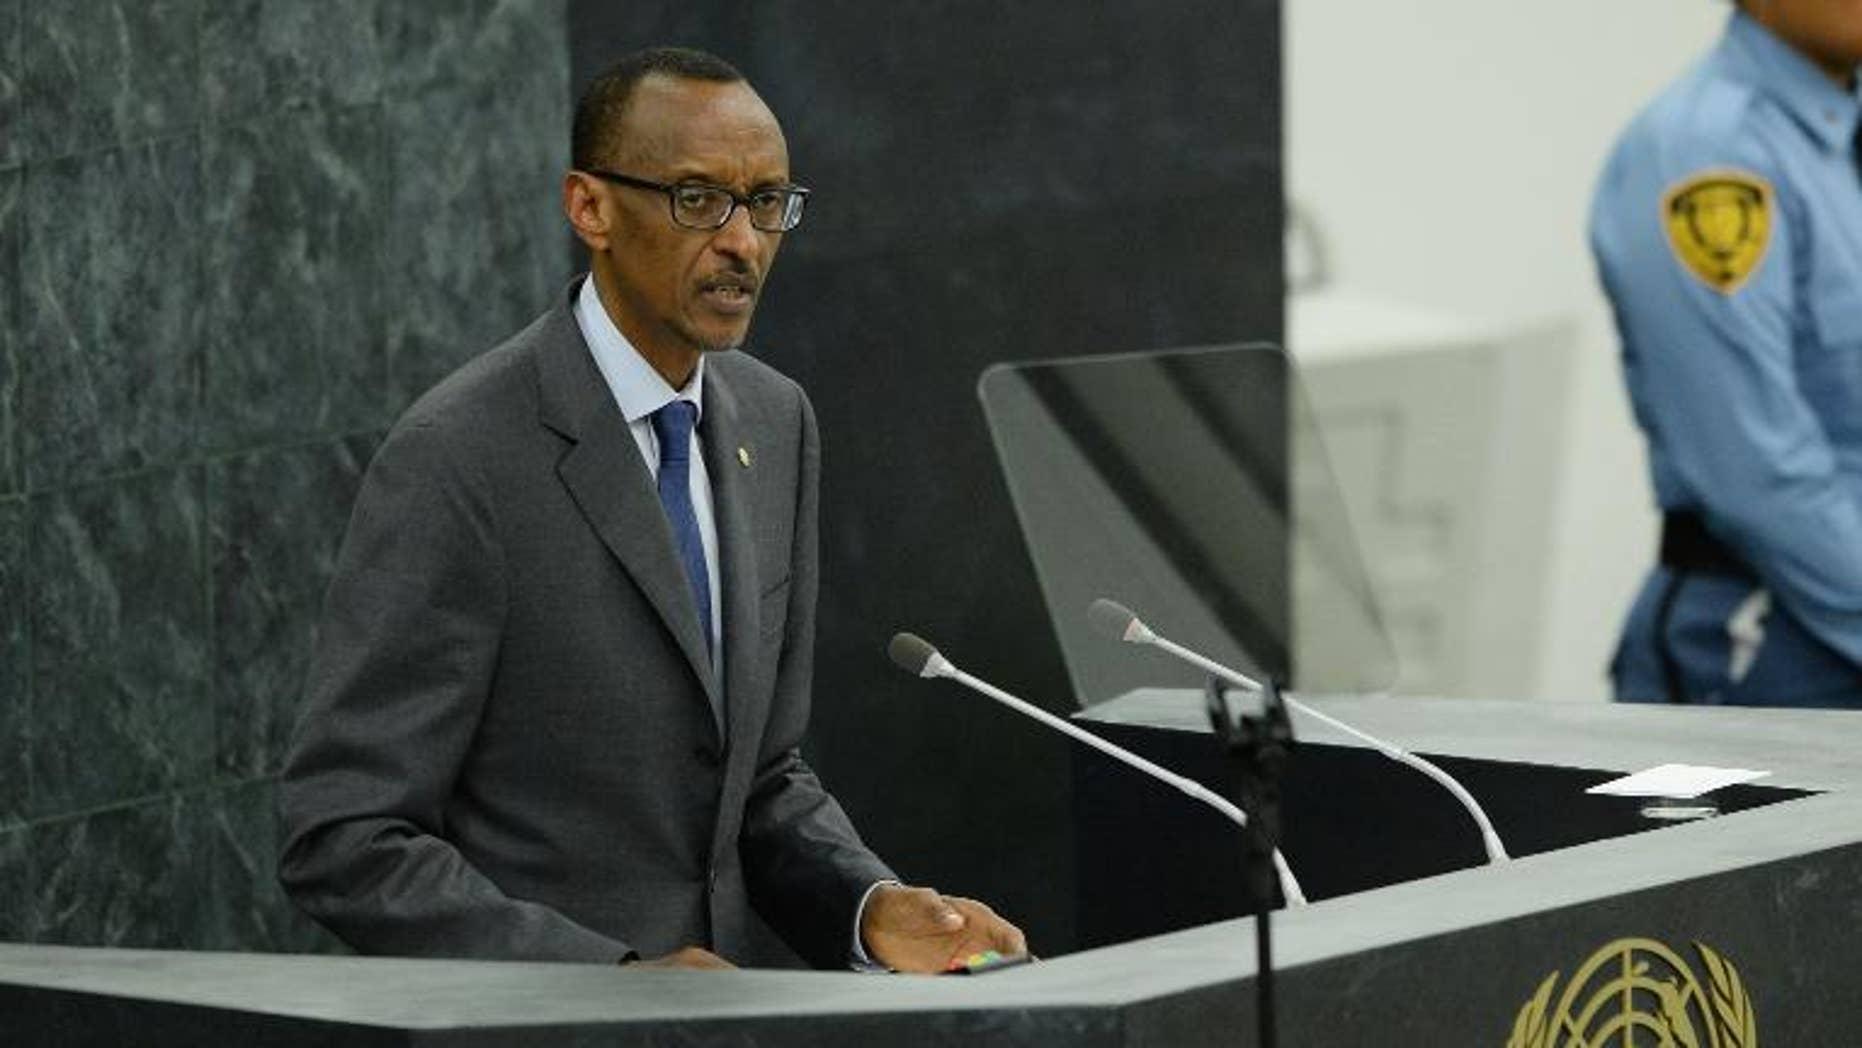 Paul Kagame, President of Rwanda, speaks at the United Nations General Assembly, September 25, 2013 in New York.